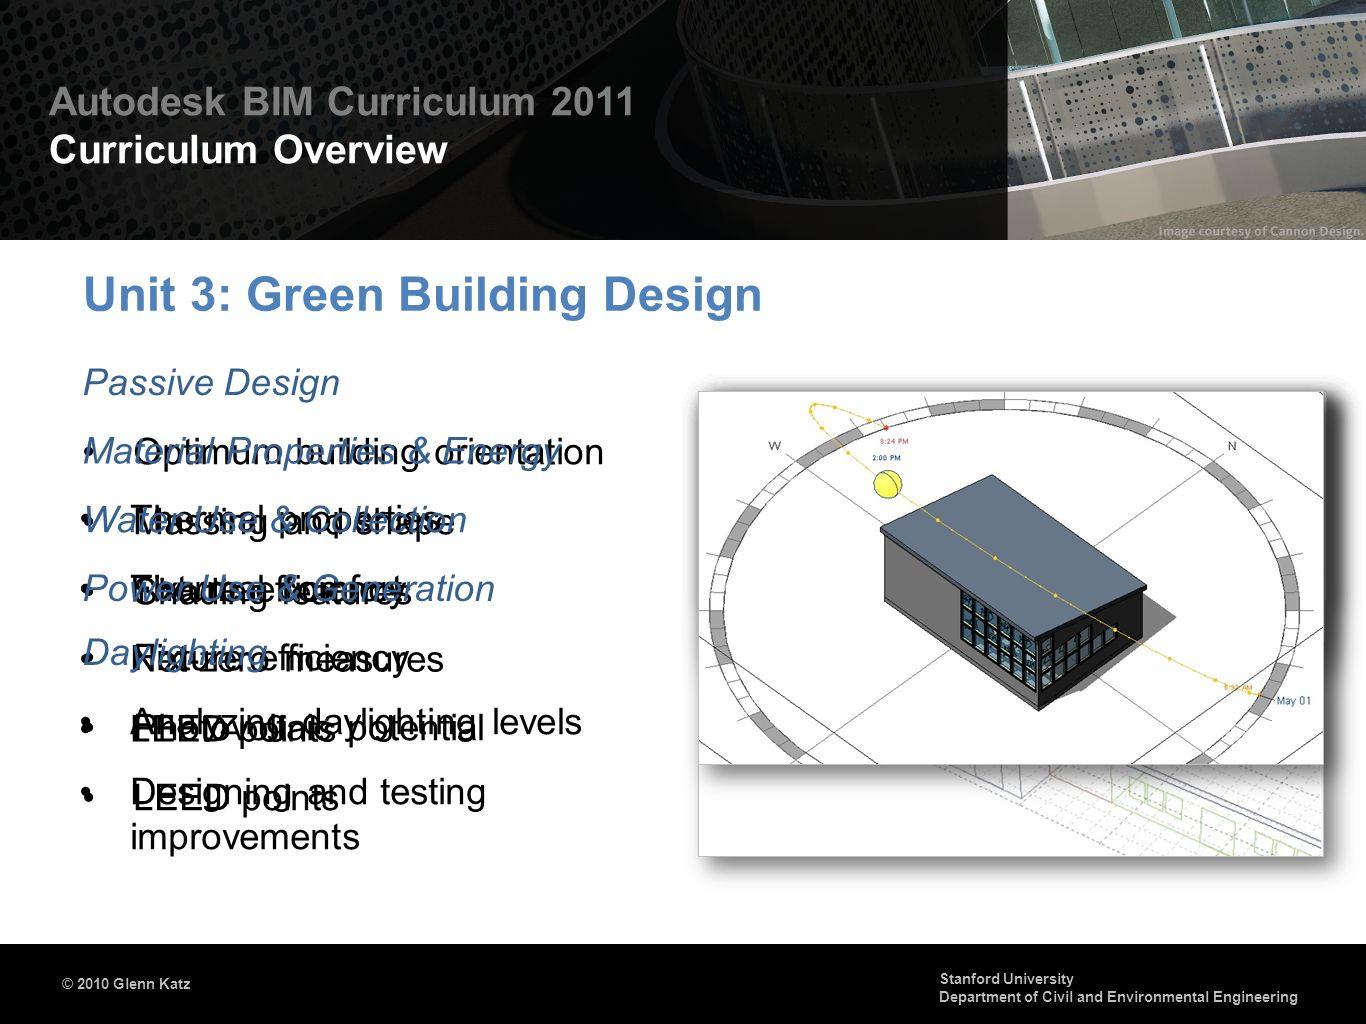 Unit 3: Green Building Design